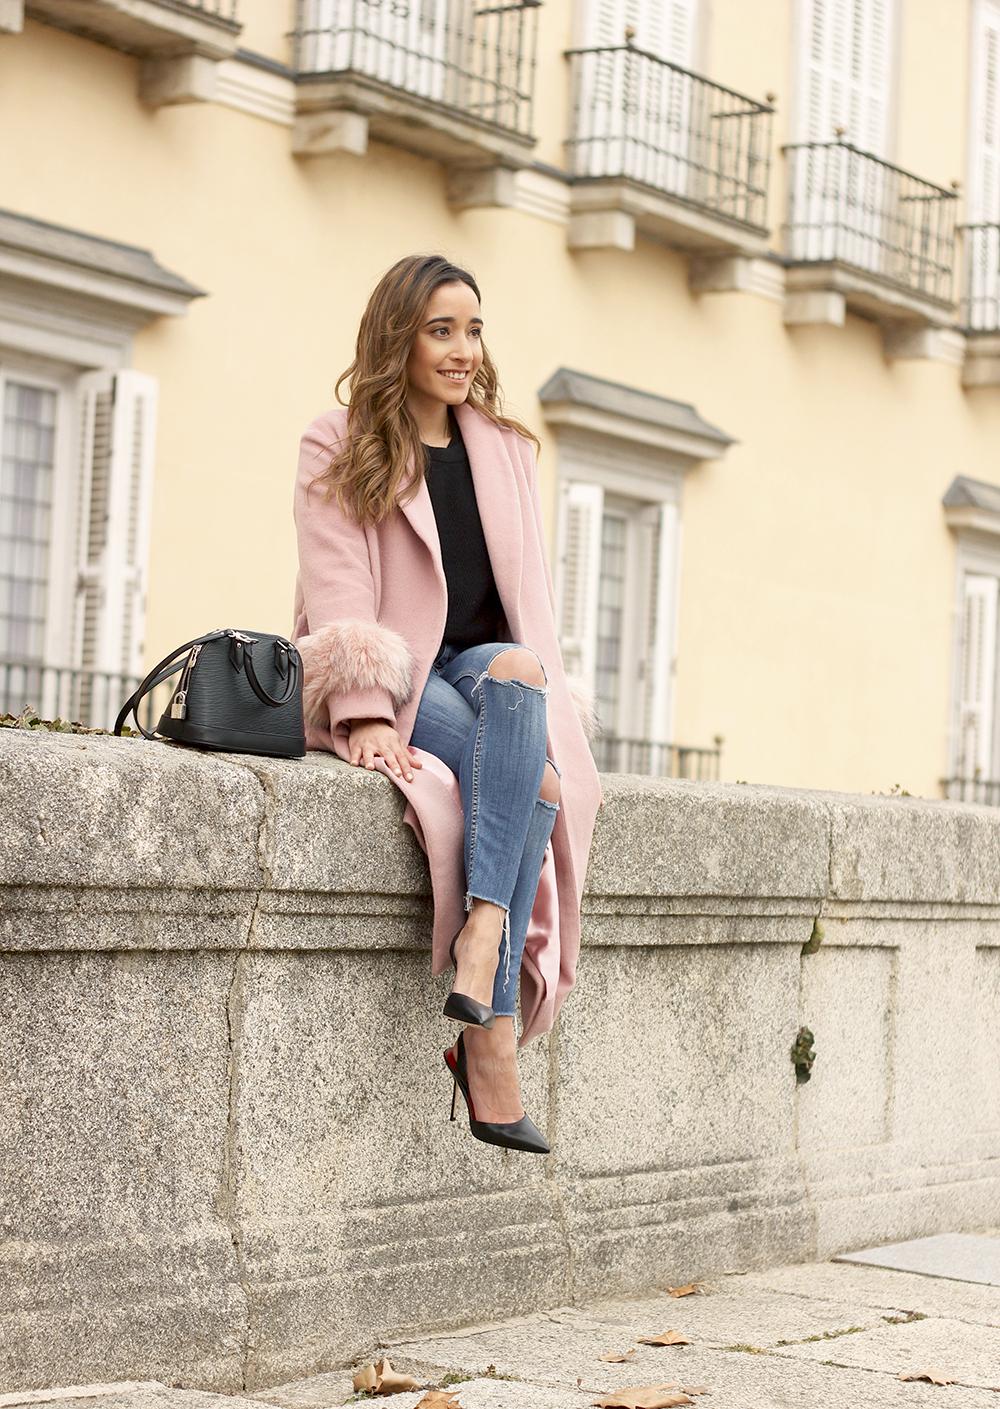 pink coat byleclair carolina herrera heels jeans louis vuitton ba street style outfit 20194